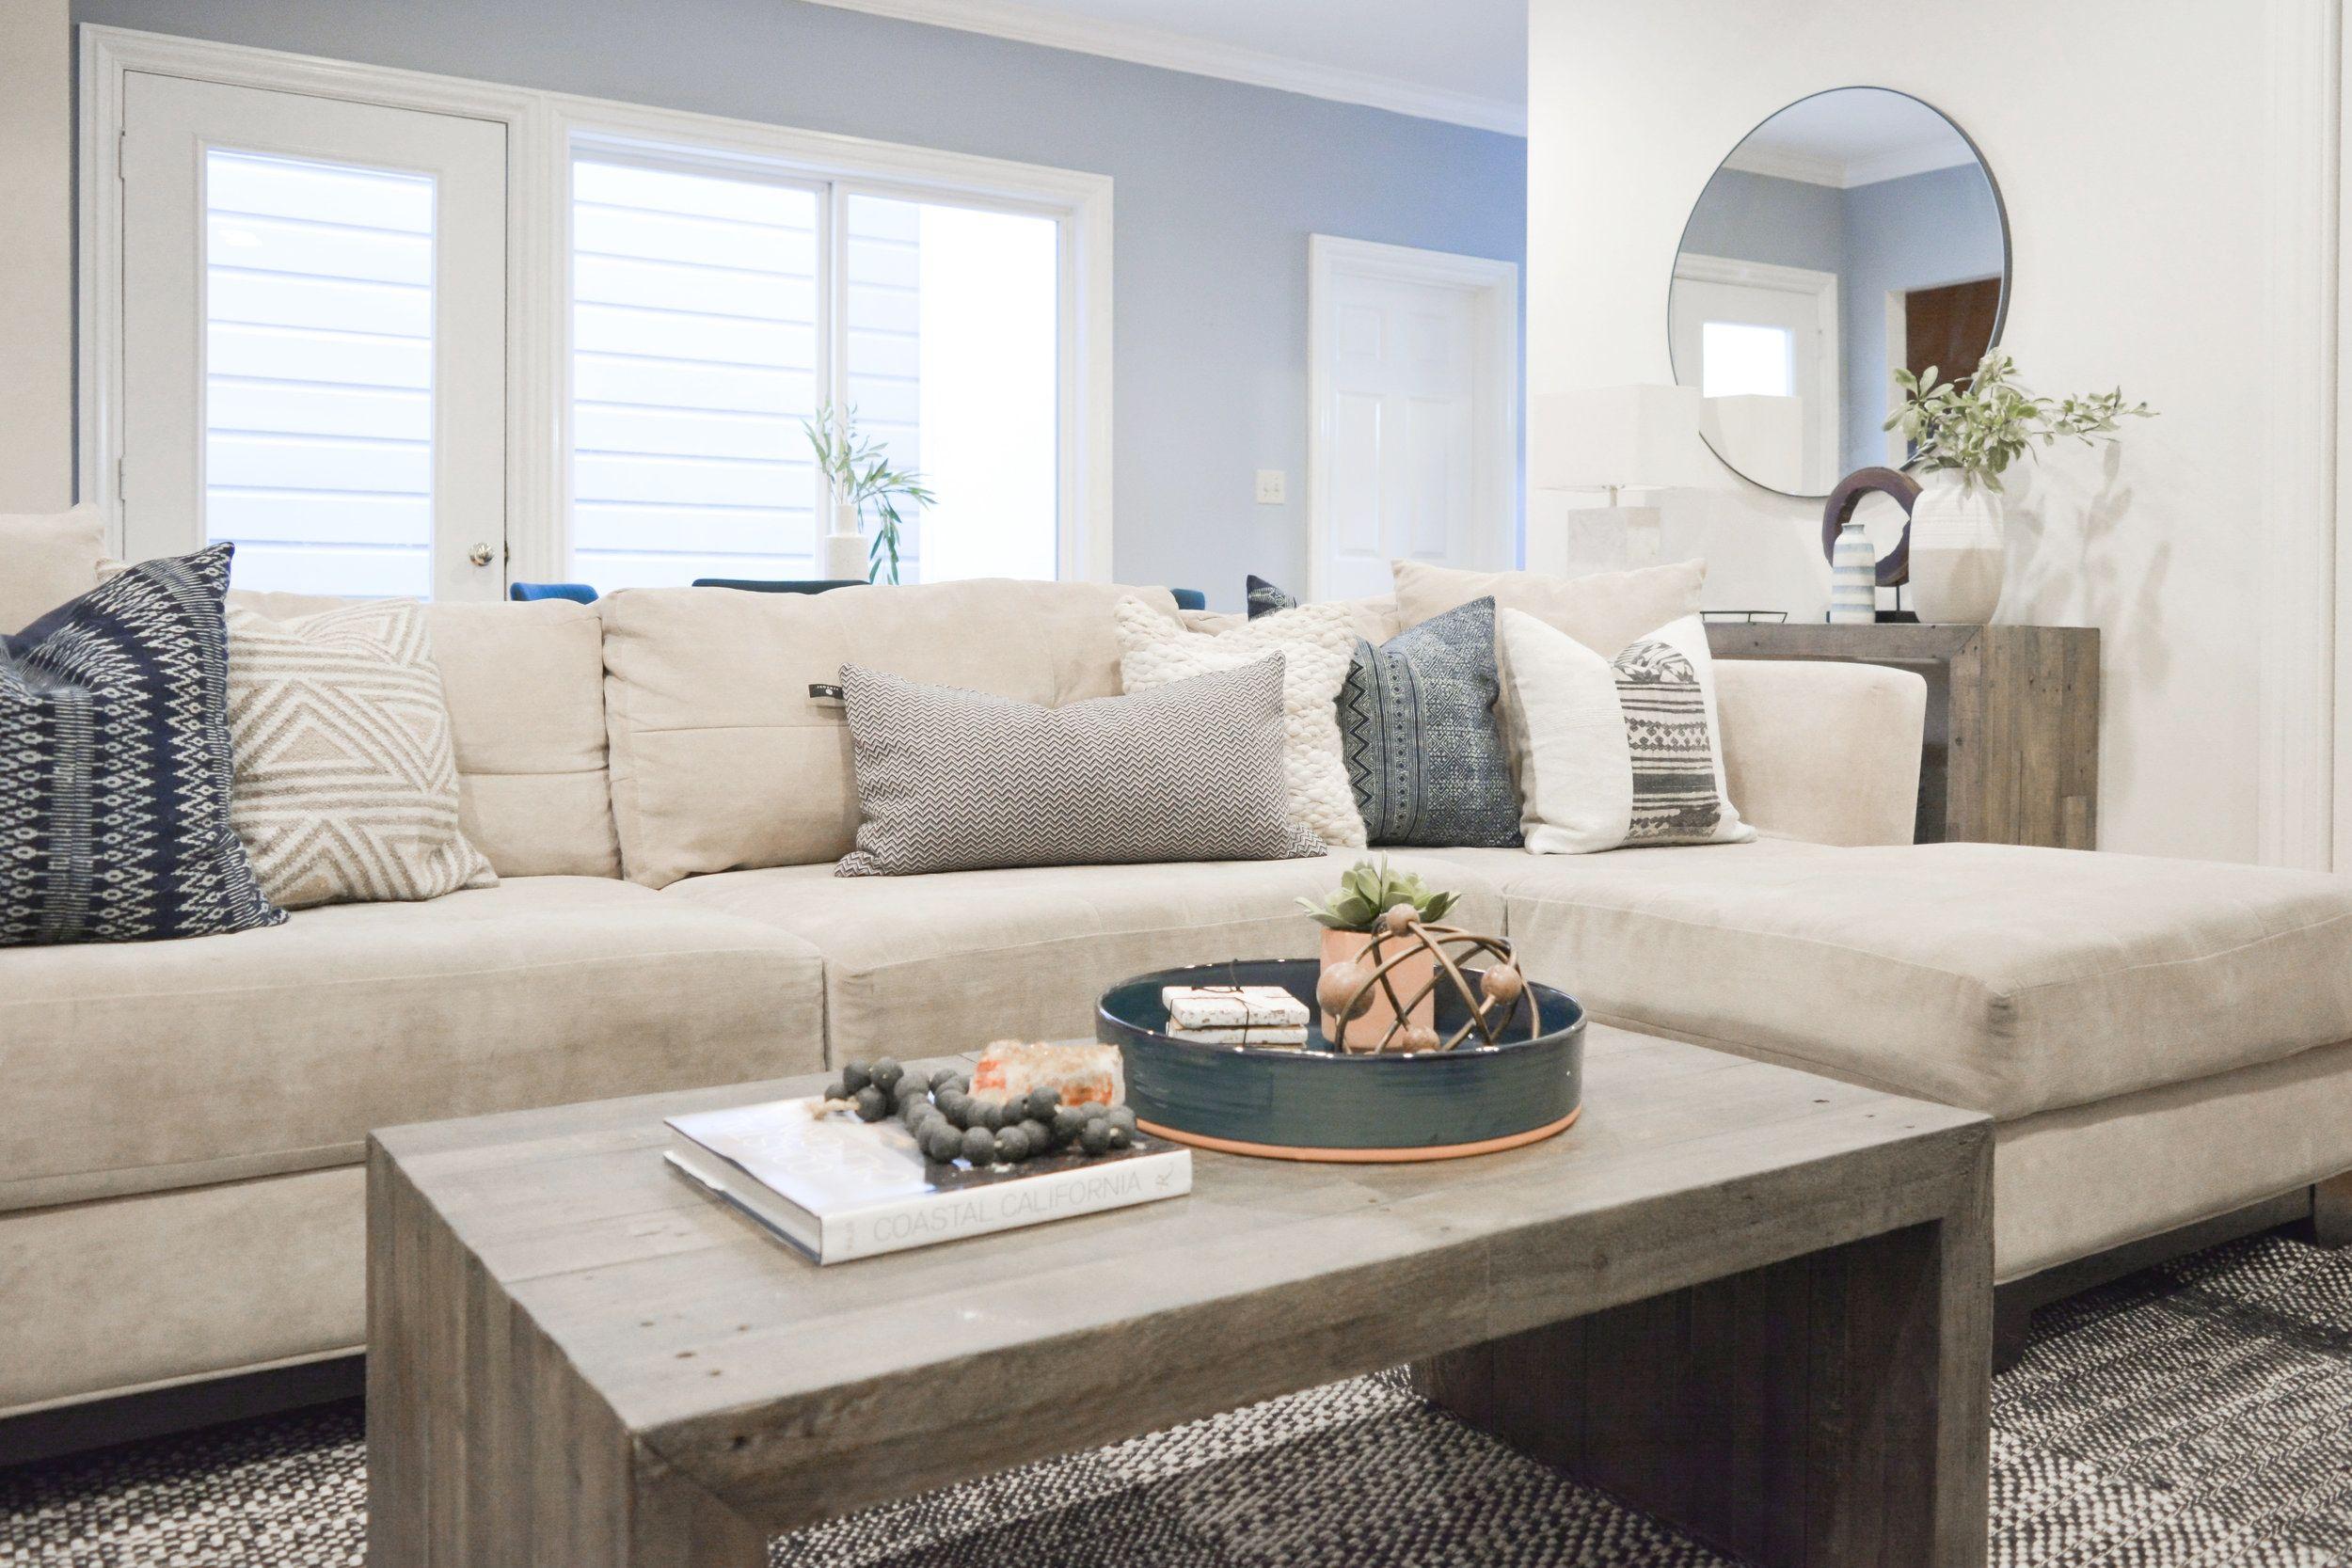 Angela Grace Design Judah Living Room And Dining San Francisco Sf Bay Area Interior Designer Decorator